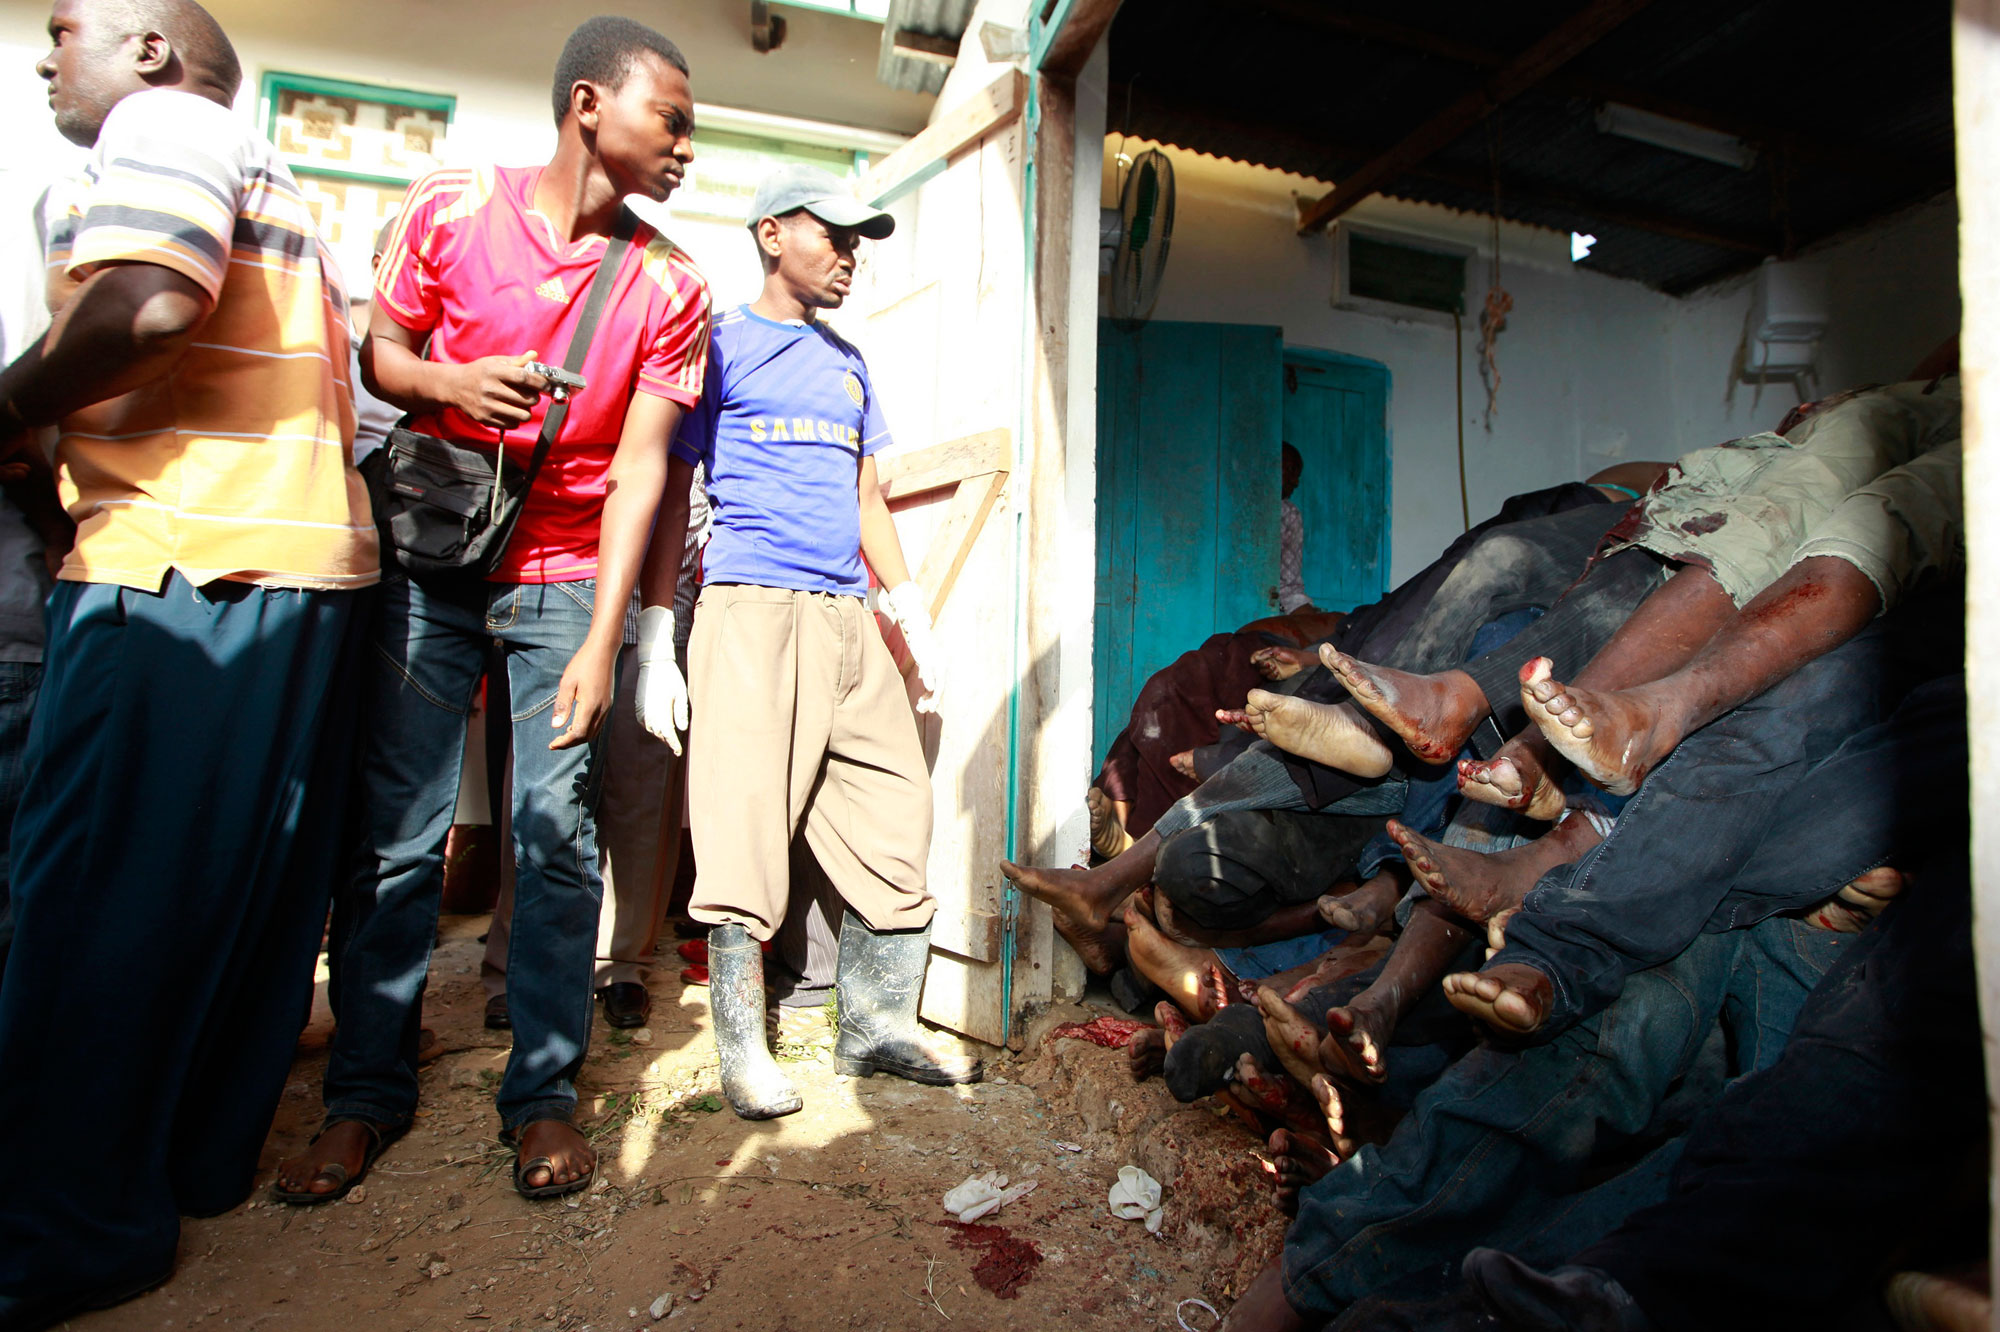 Attaque Terroriste Meurtrière Au Kenya